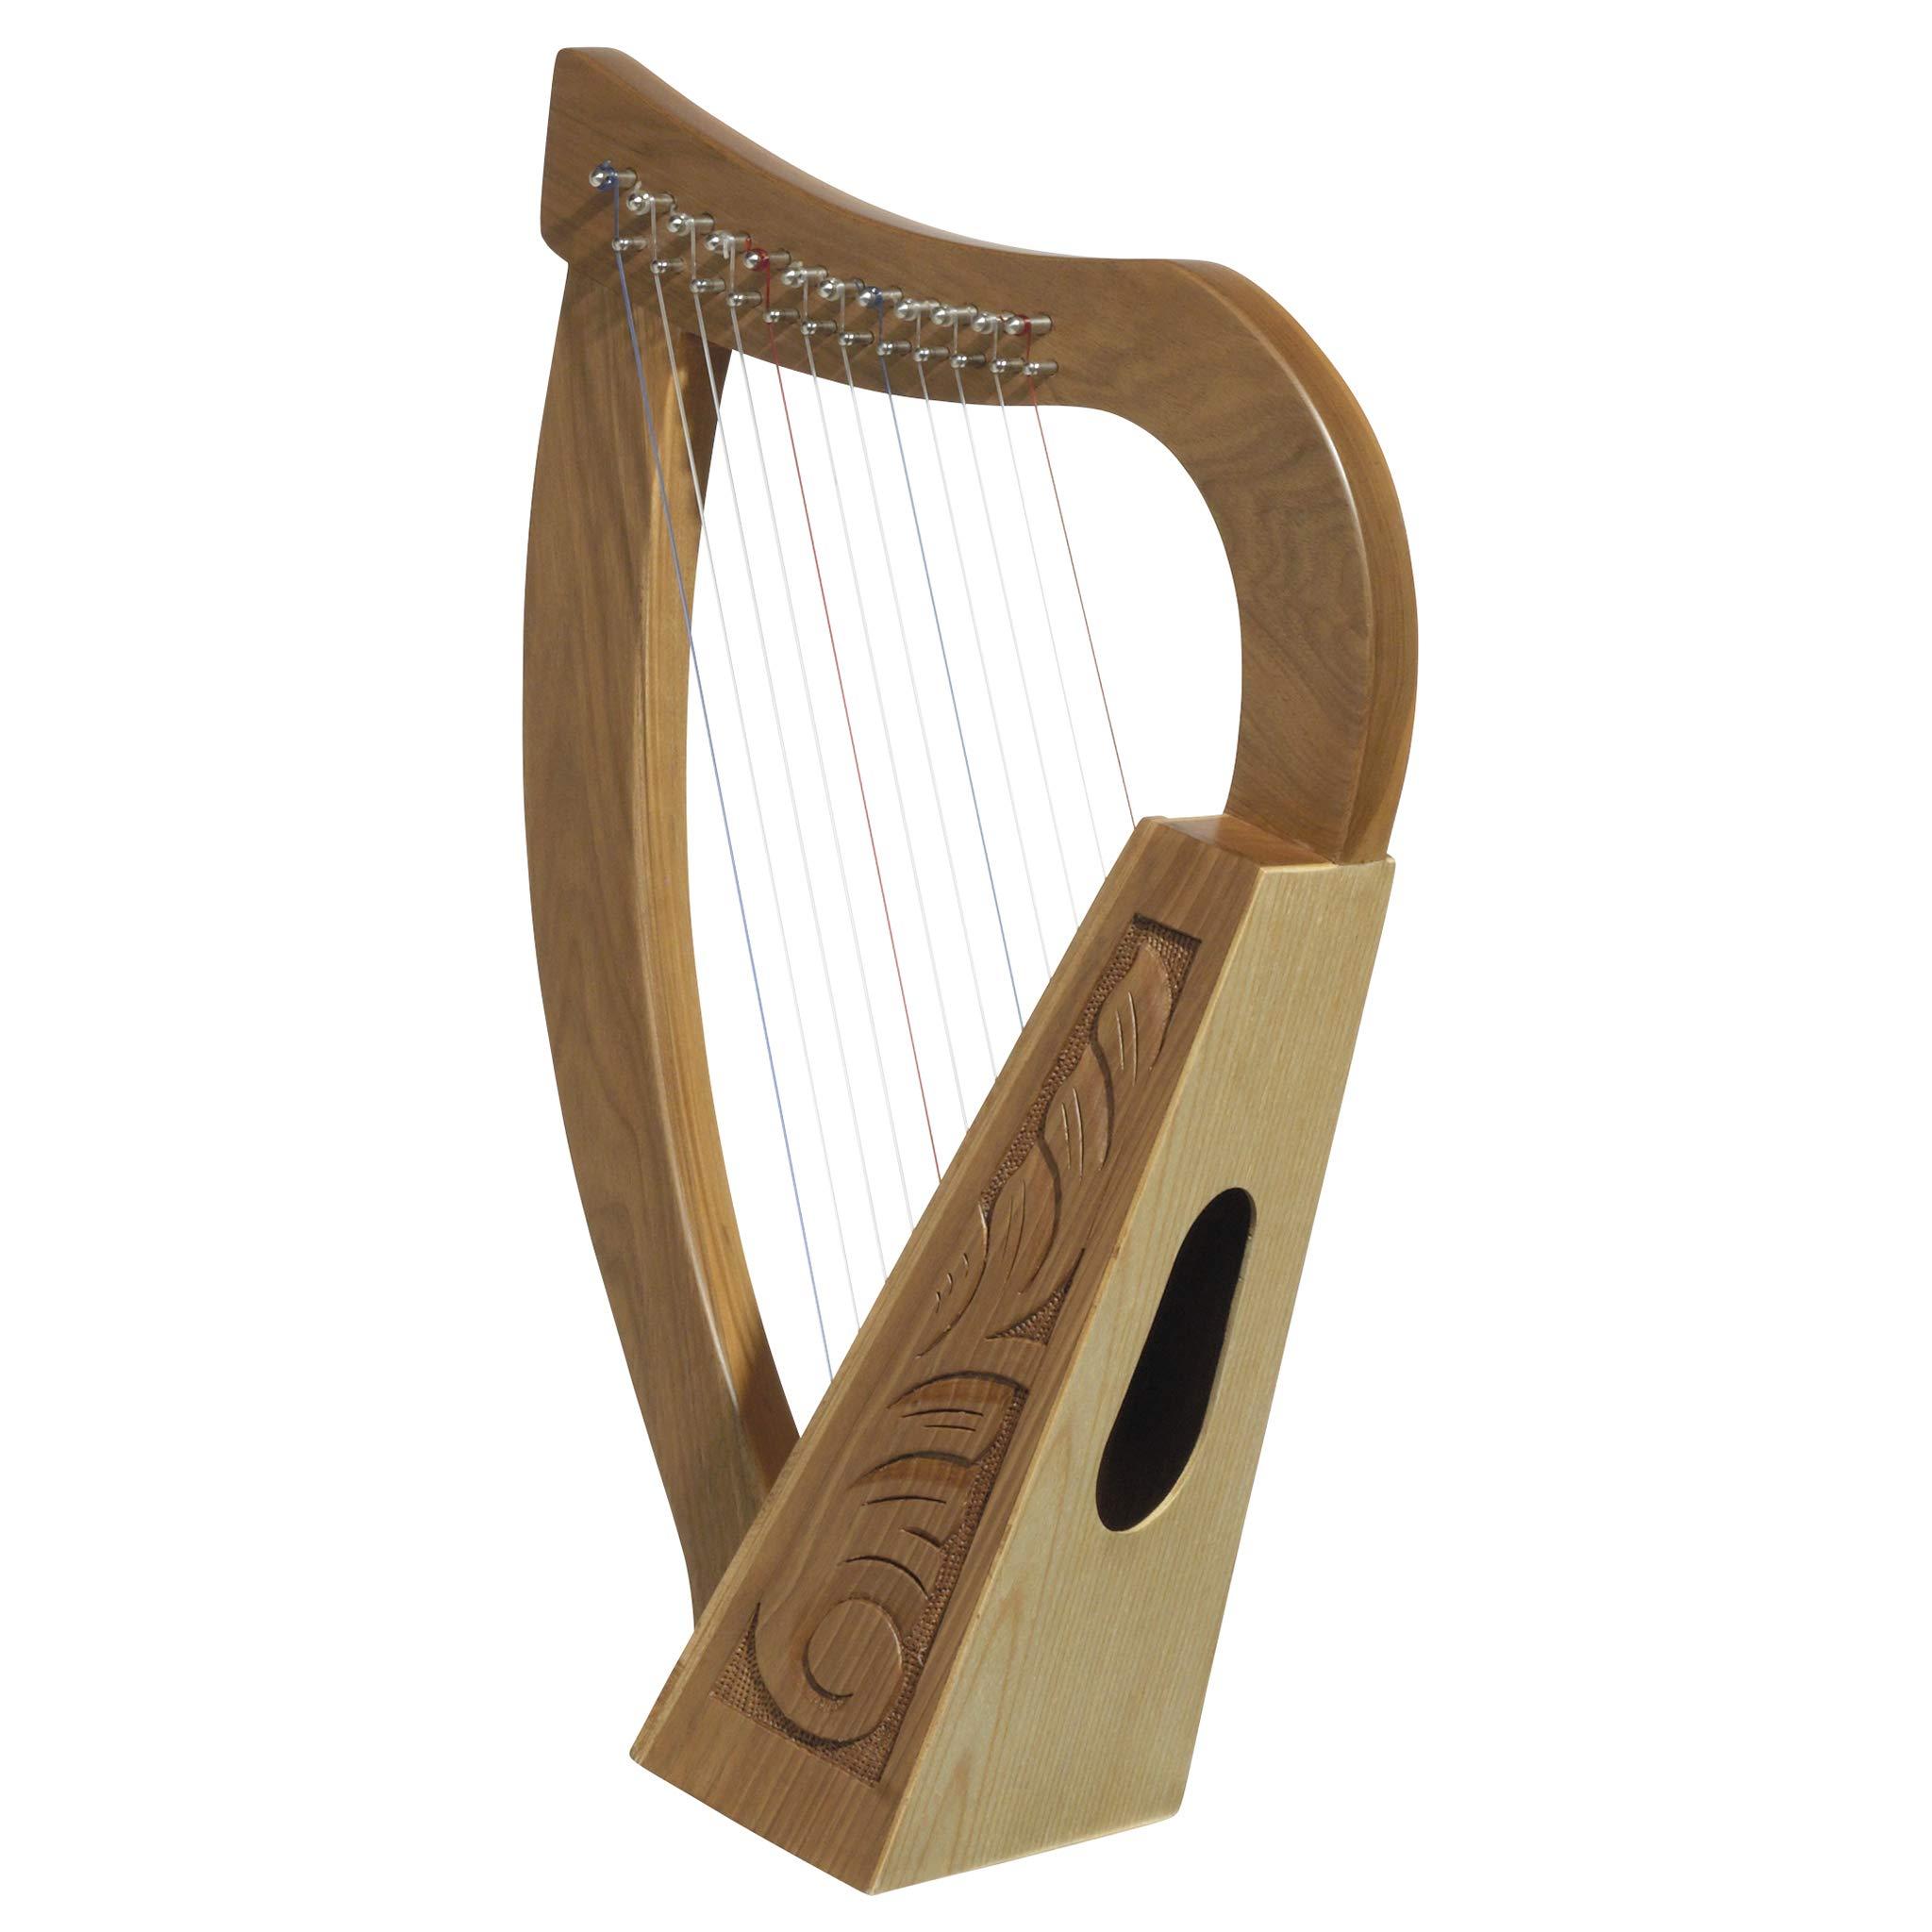 Design Toscano Celtic Knot Walnut Tara Harp Instrument and Display, 20 Inch, Walnut and Birch Wood, Natural by Design Toscano